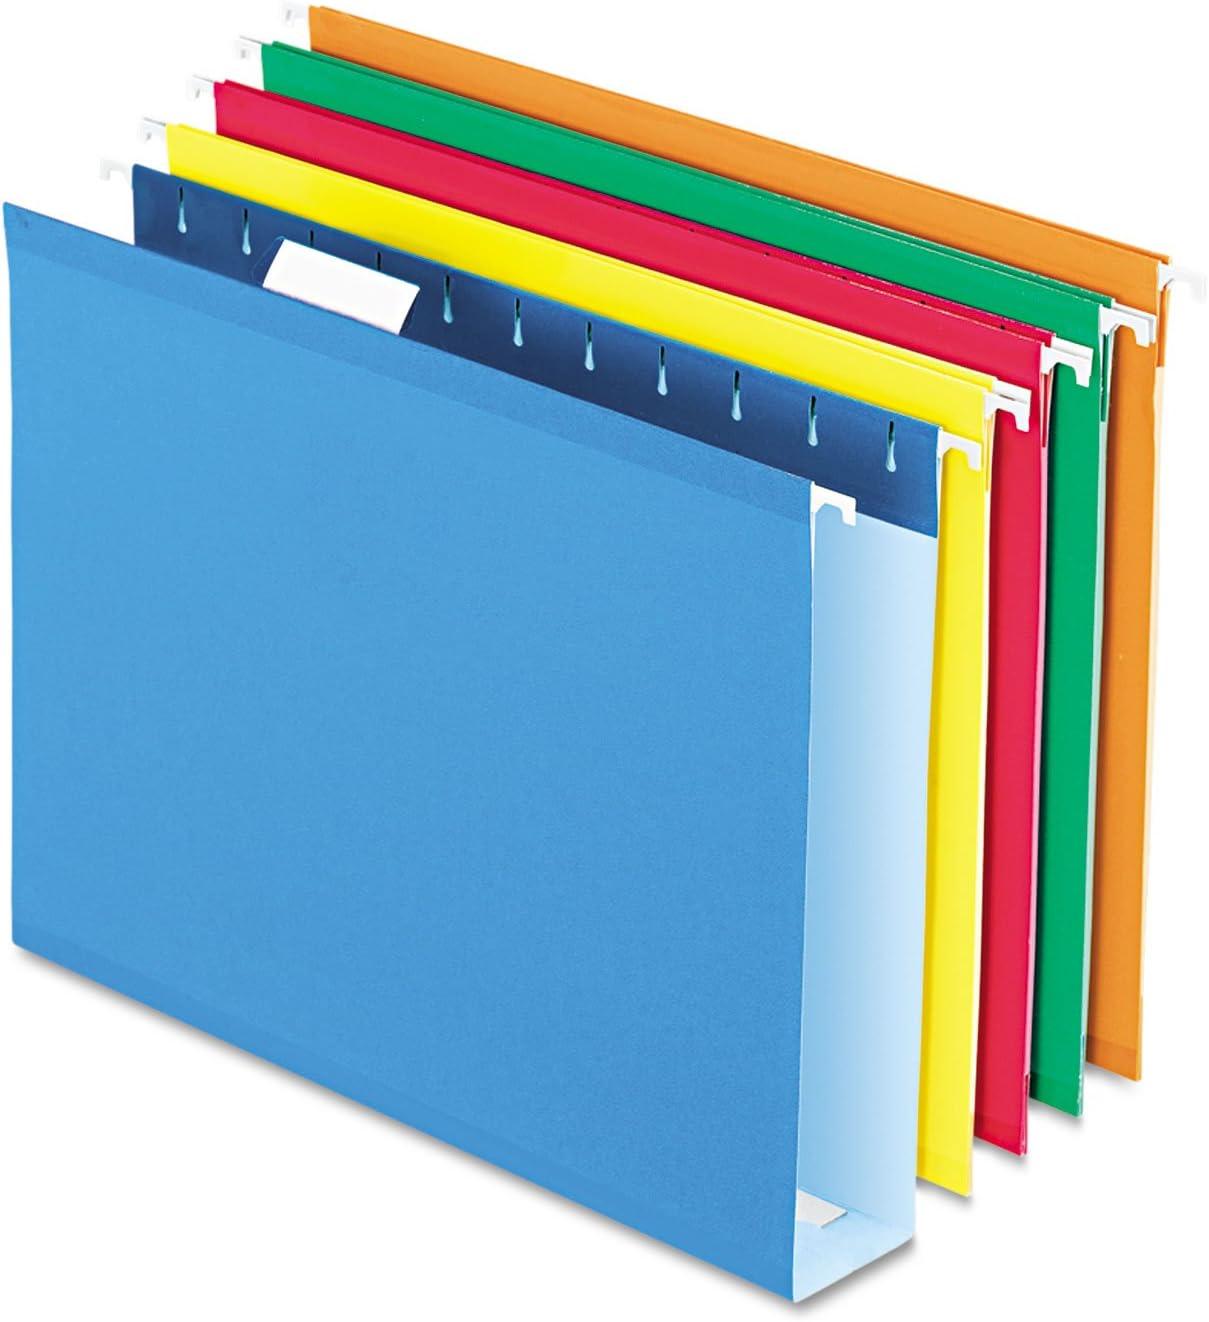 Pendaflex 4152X2ASST Department store Fixed price for sale Box Bottom Folders Letter 2-Inch Cap Size